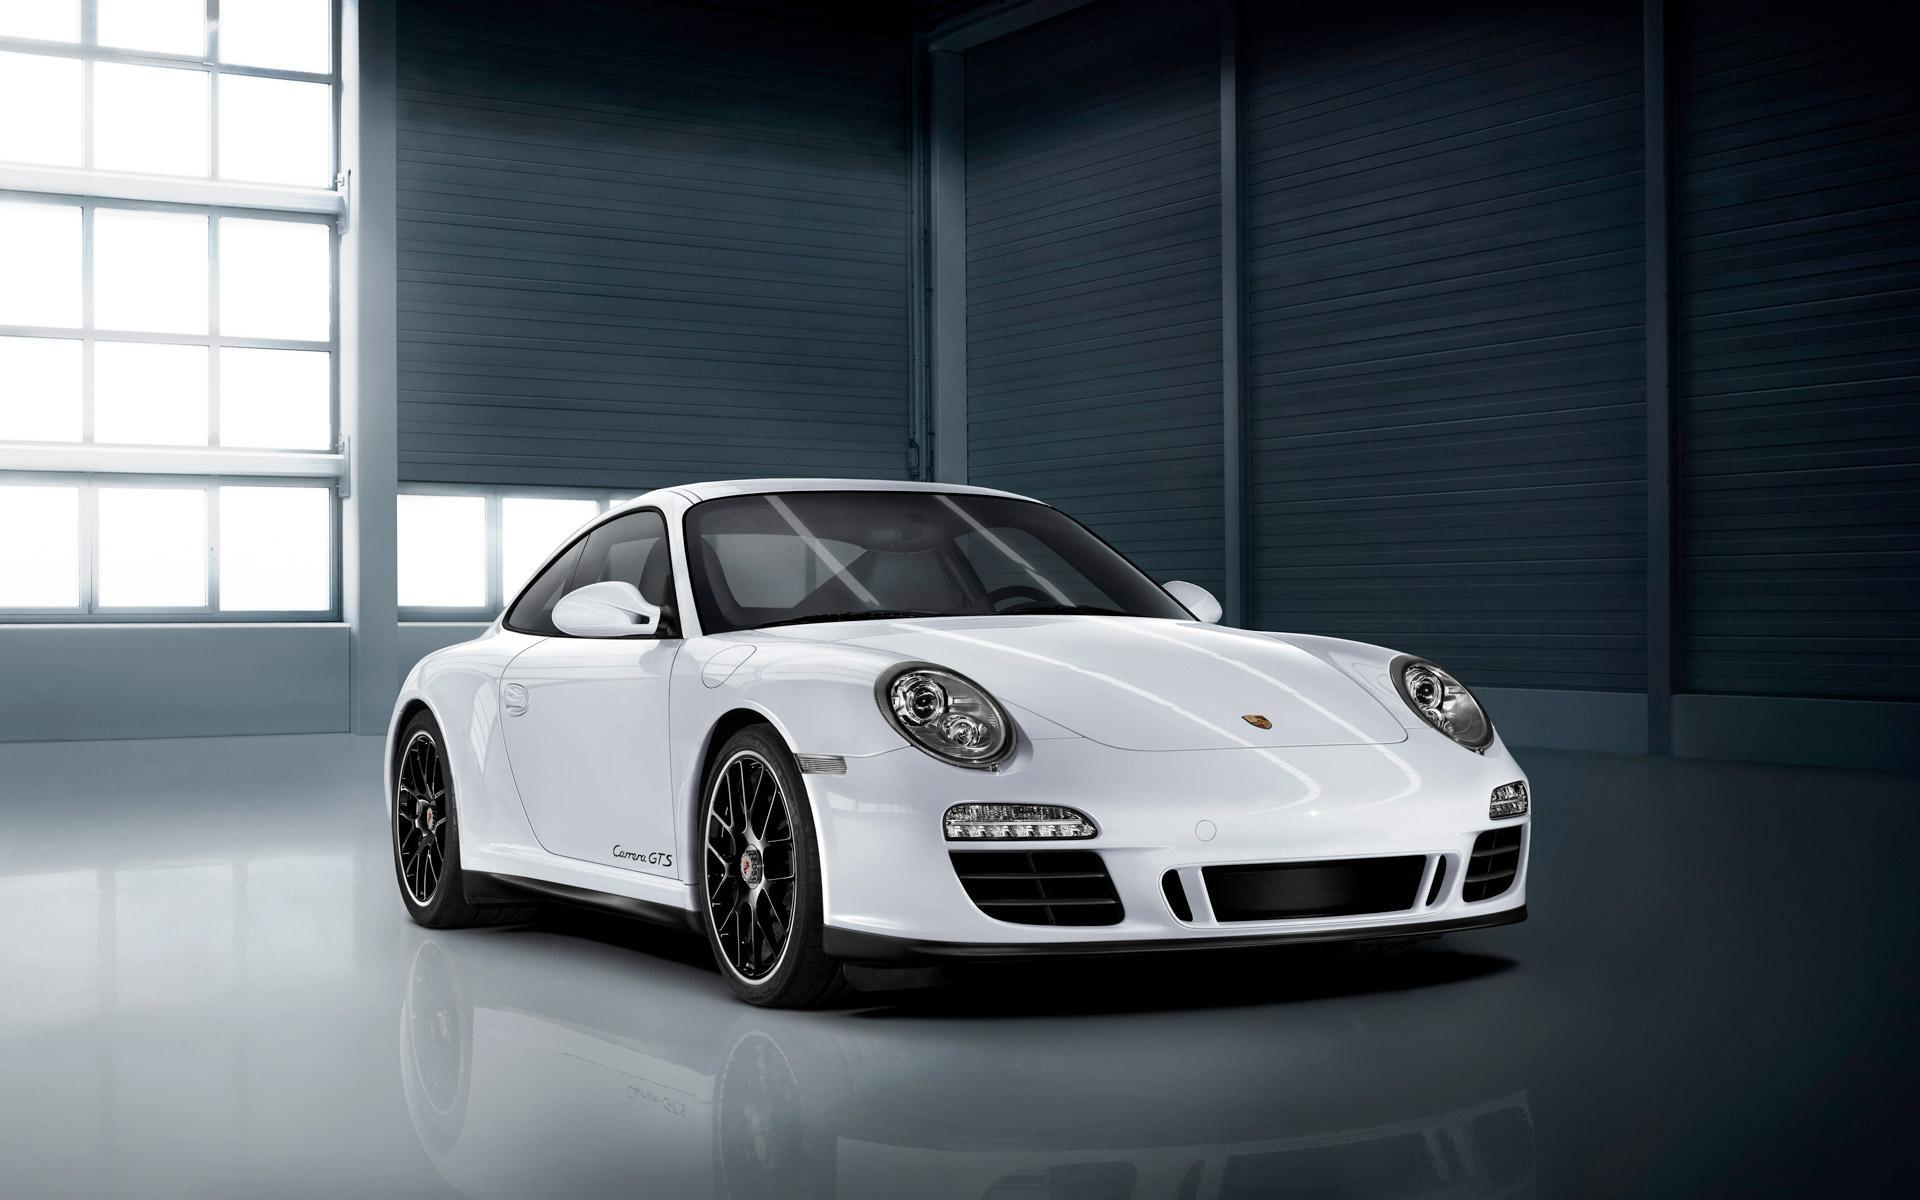 Porsche Carrera GTS Wallpapers